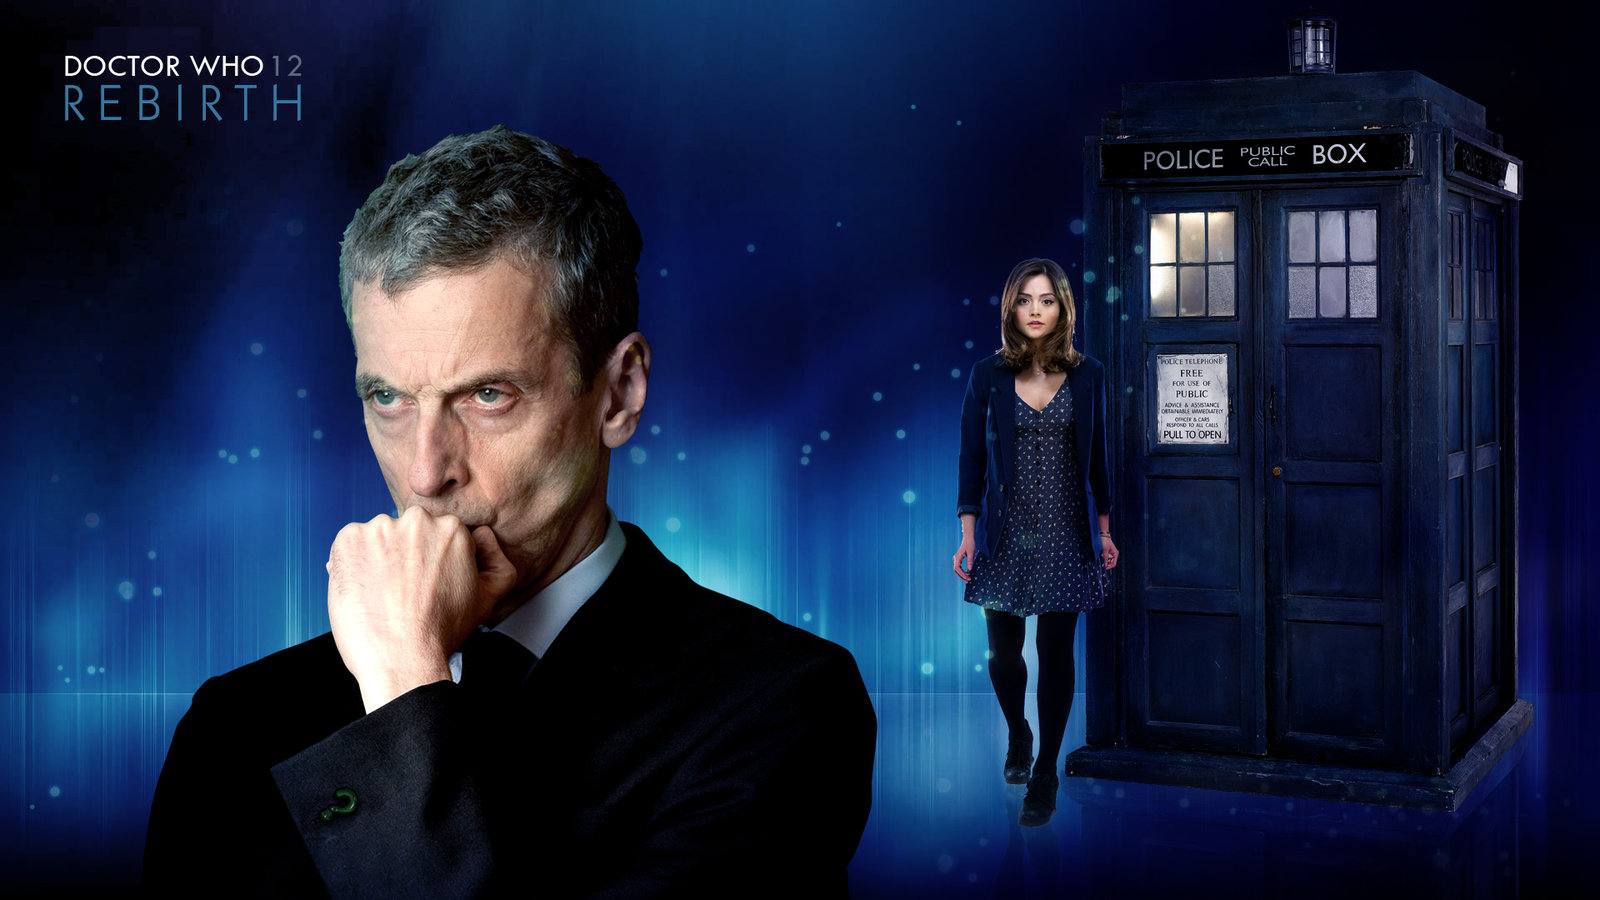 Doctor Who Wallpaper Peter Capaldi 1600x900